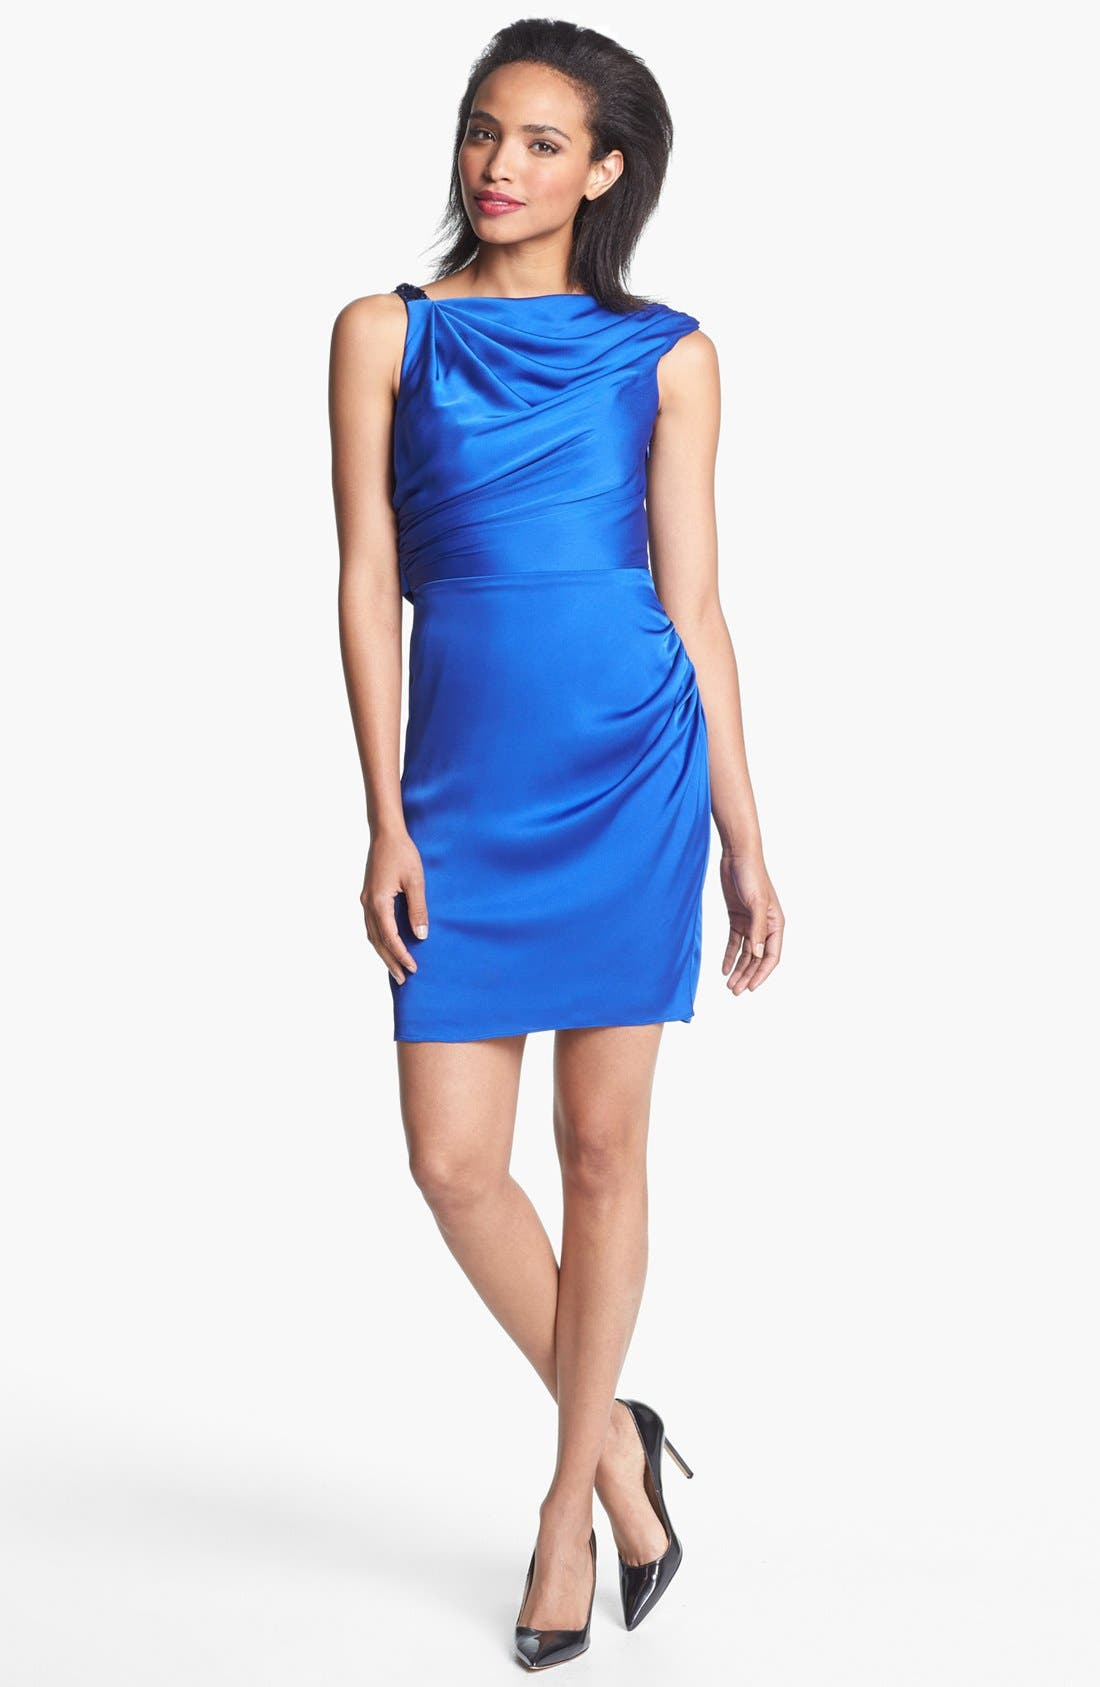 Alternate Image 1 Selected - Aidan Mattox Embellished Draped Satin Sheath Dress (Online Only)